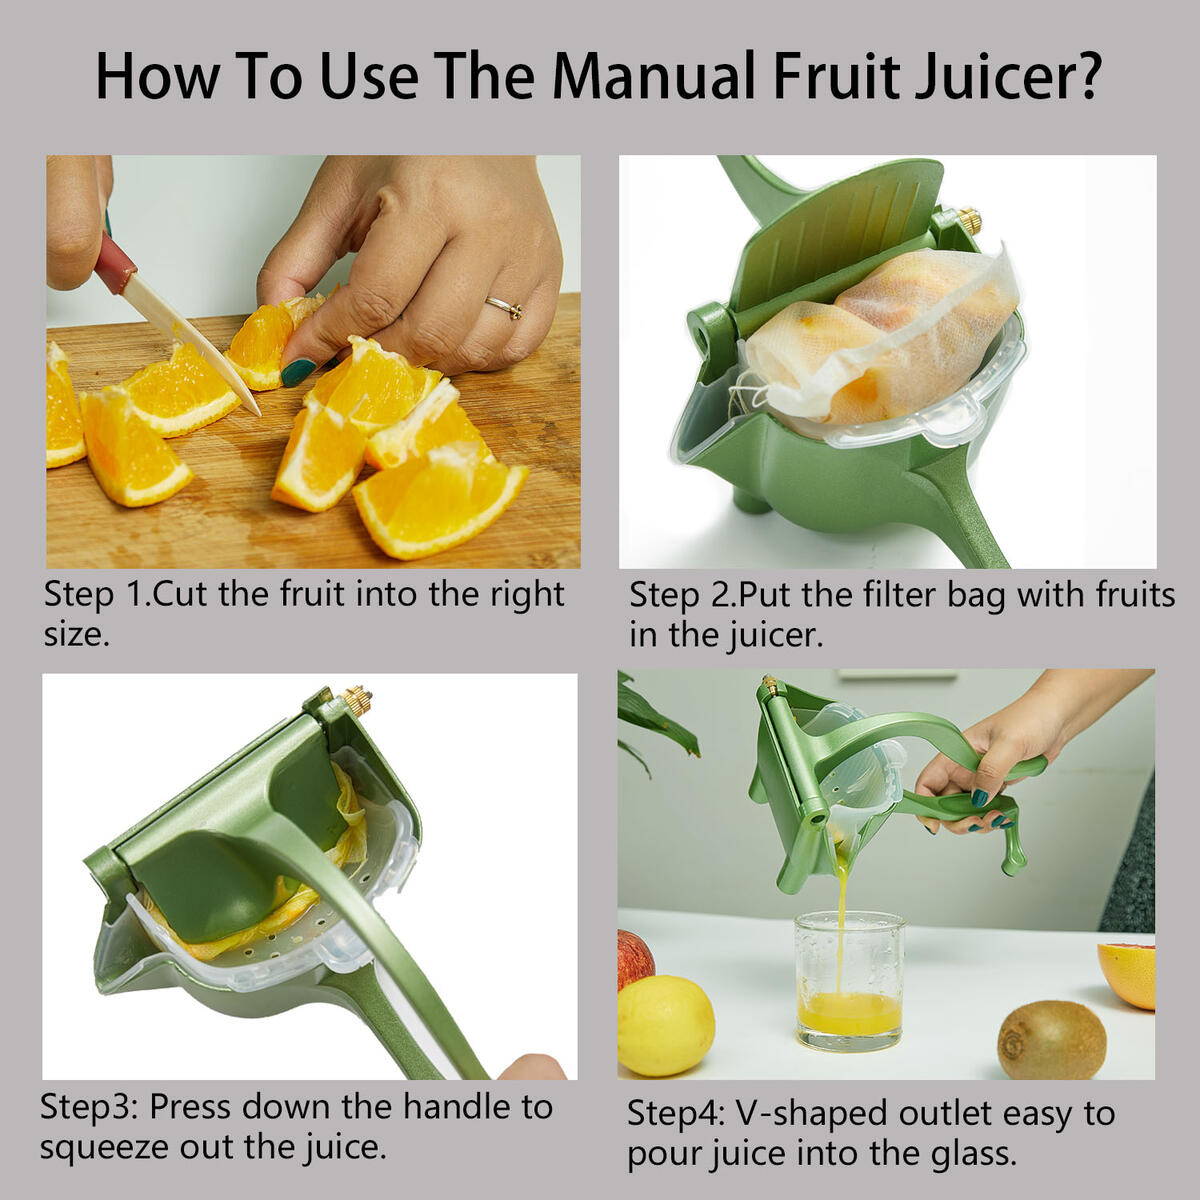 Manual Fruit Juicer With Detachable Liner Hand Press Teflon Fruit Juicer Premium Quality Metal Aluminum alloy Lemon Squeezer with 5 pcs Filter Bags and 1 Fruit Clip Green Manual Juicer, DIDU